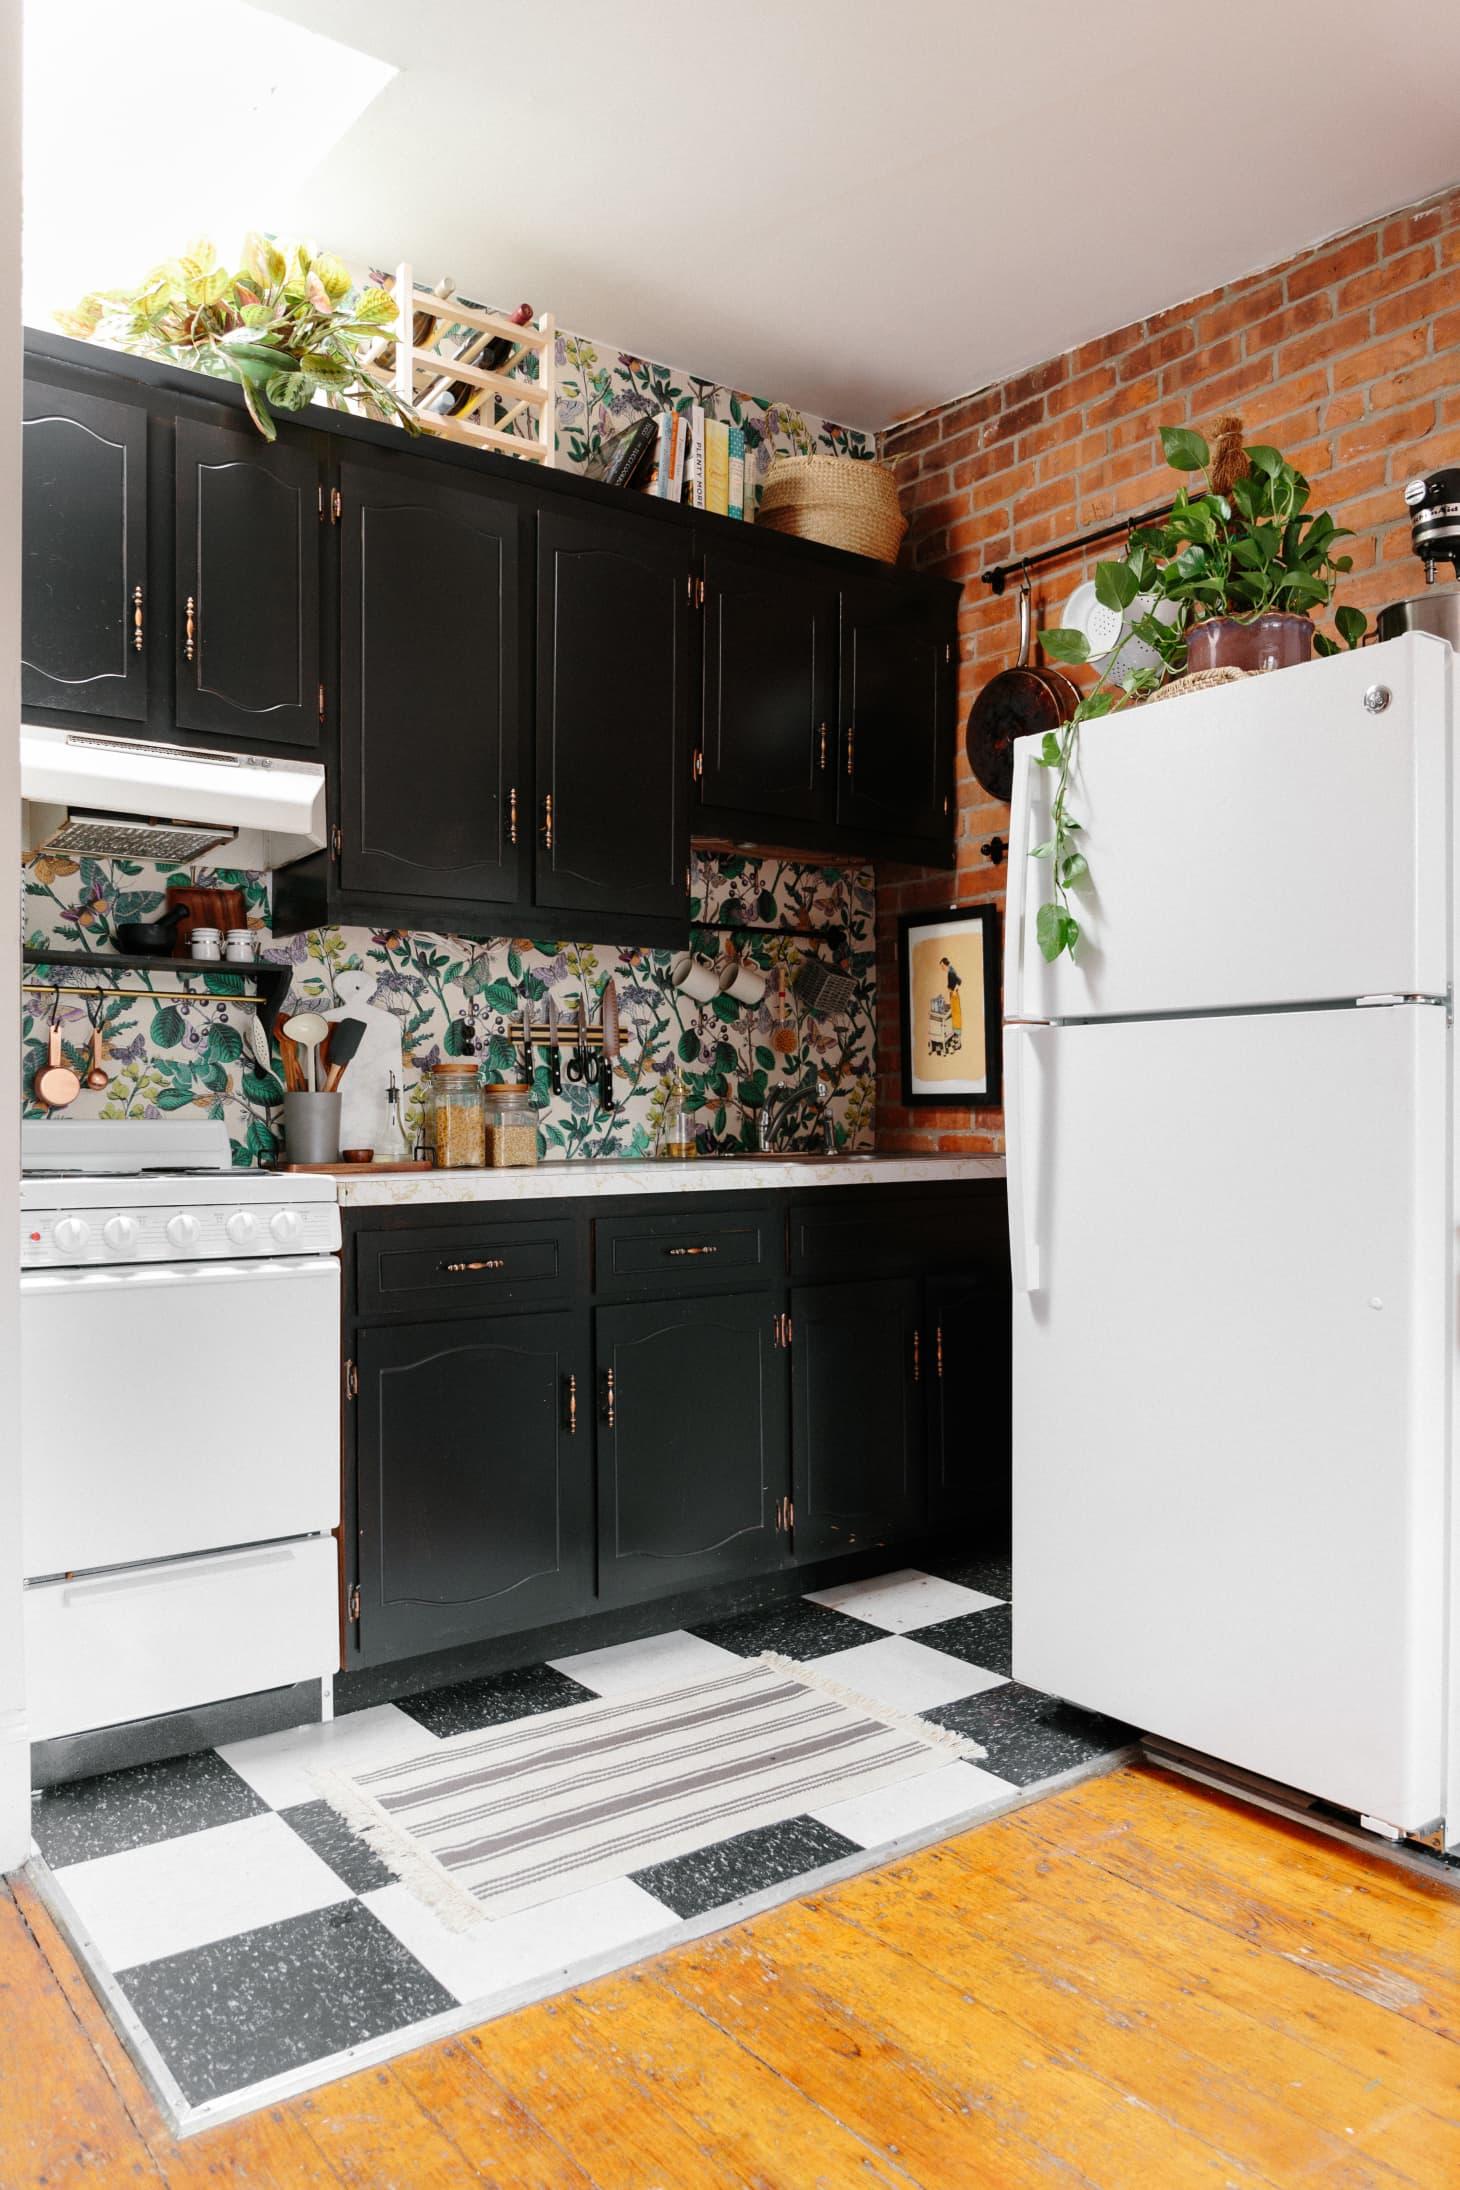 10 Ways to Create Storage in a Small Rental Kitchen | Kitchn